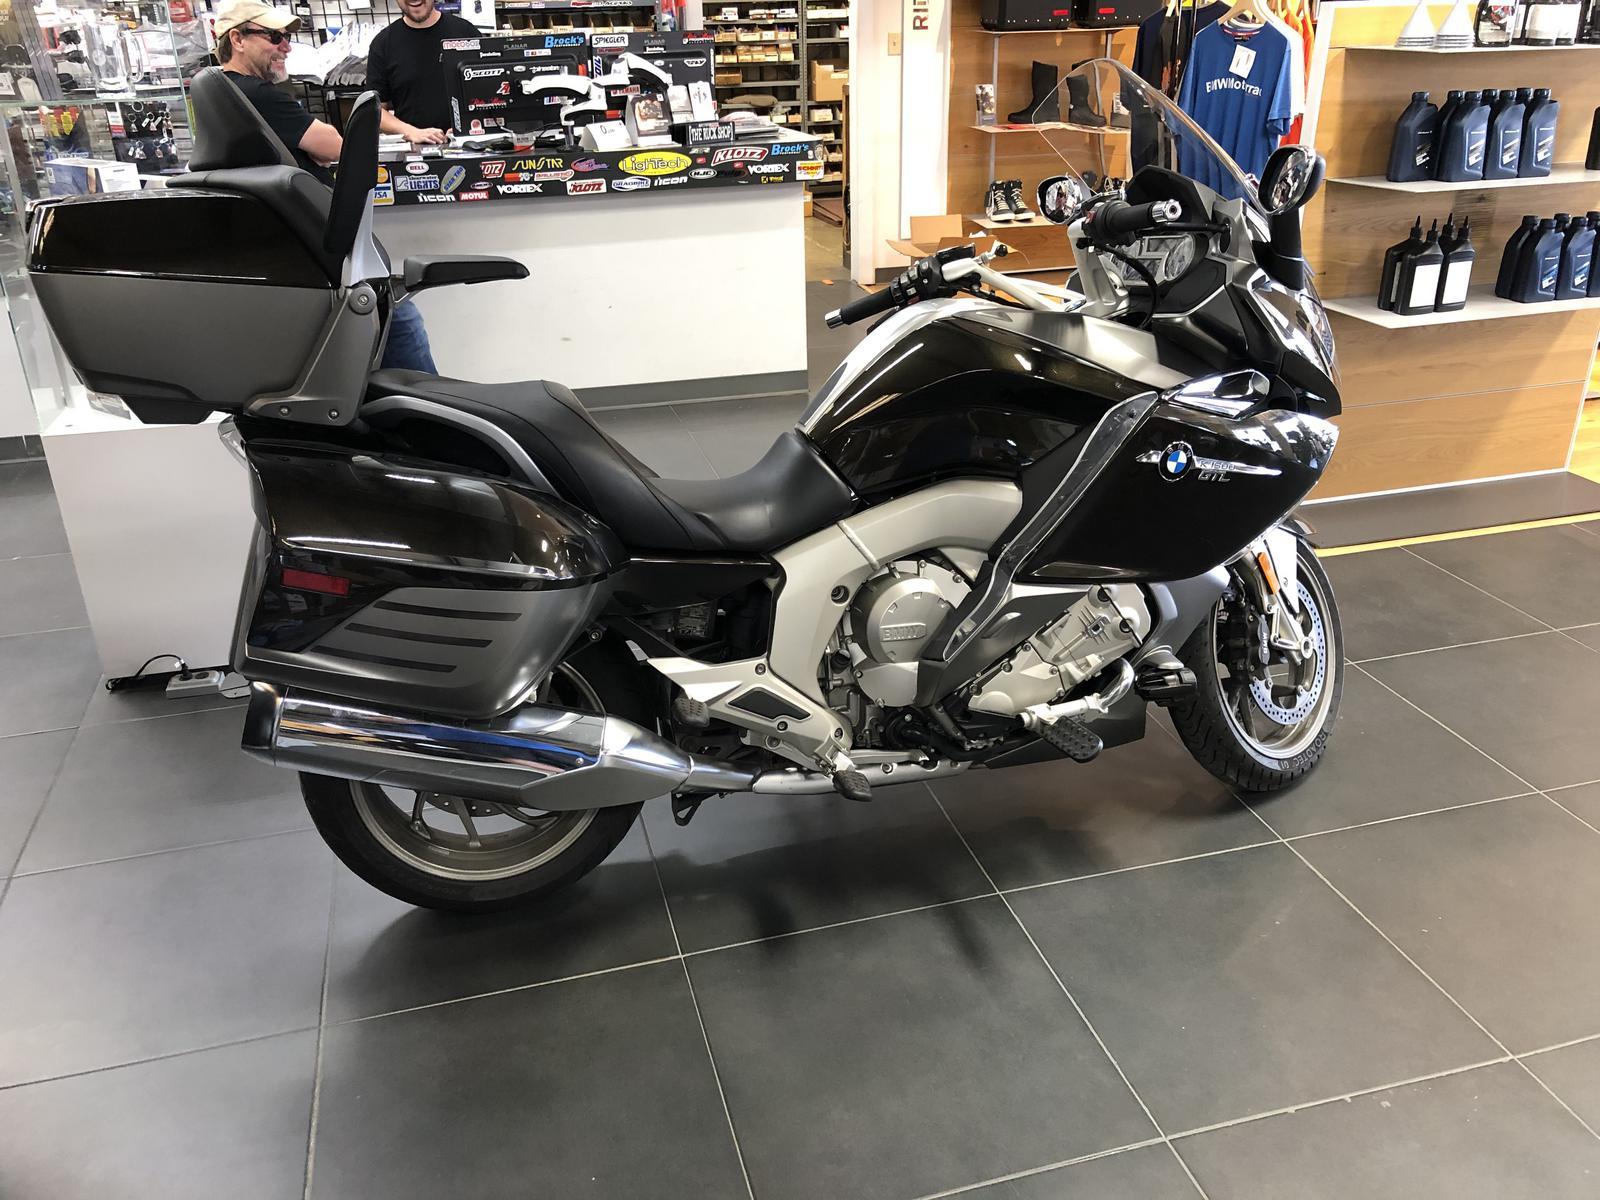 Inventory Performance Plus Motorcycle ATV Specialist, Inc  Memphis